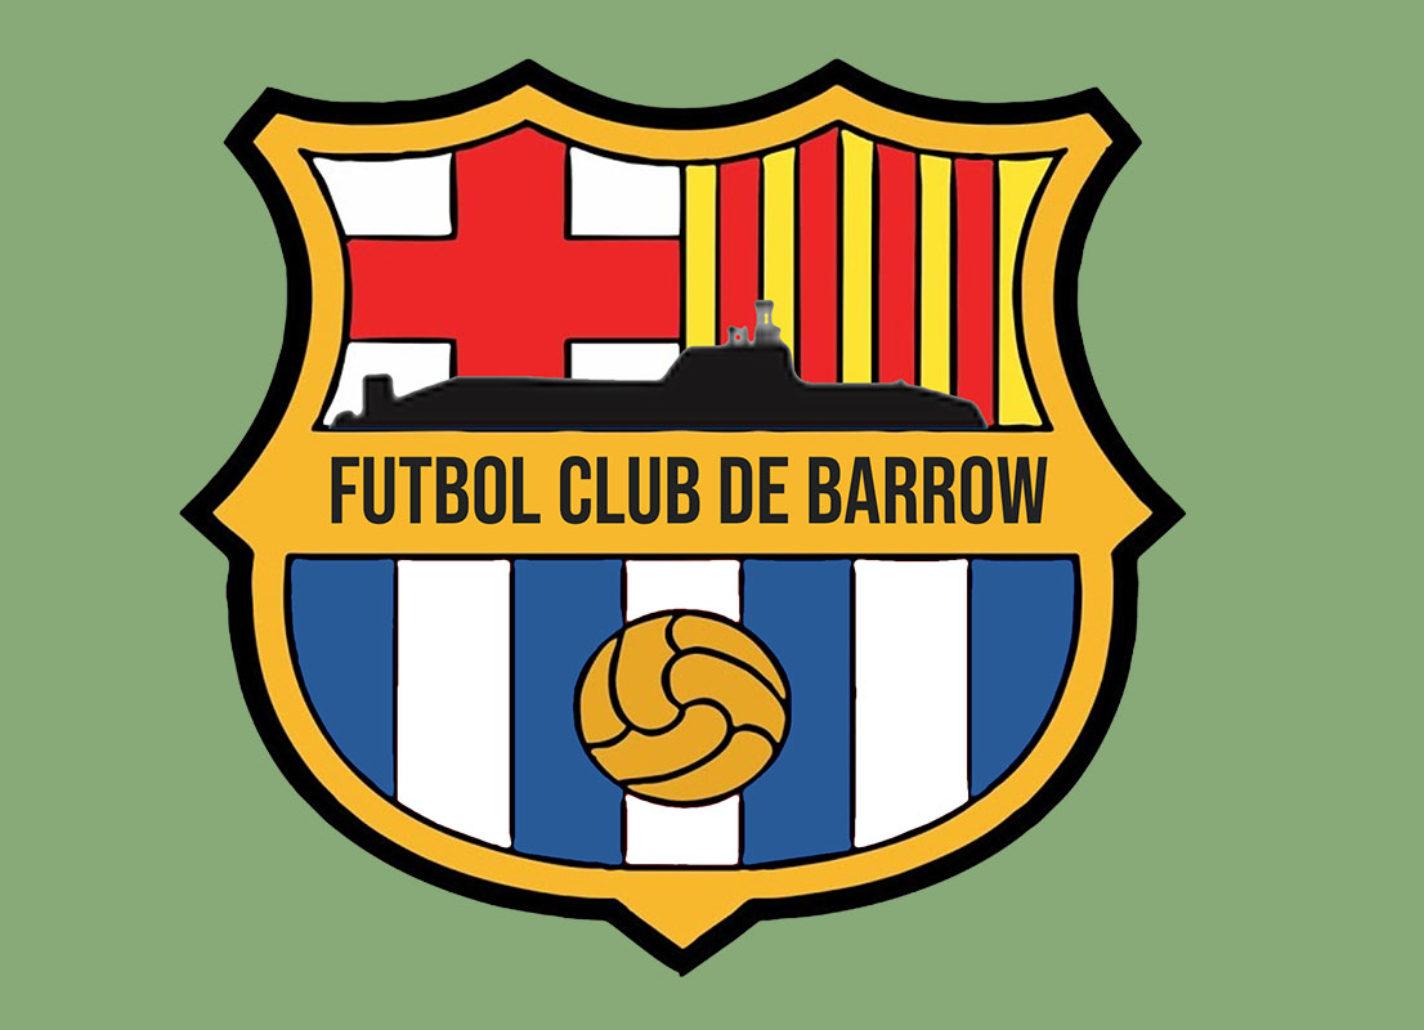 A Barcelona crest that says Futbol Club de Barrow which has become Barrowcelona